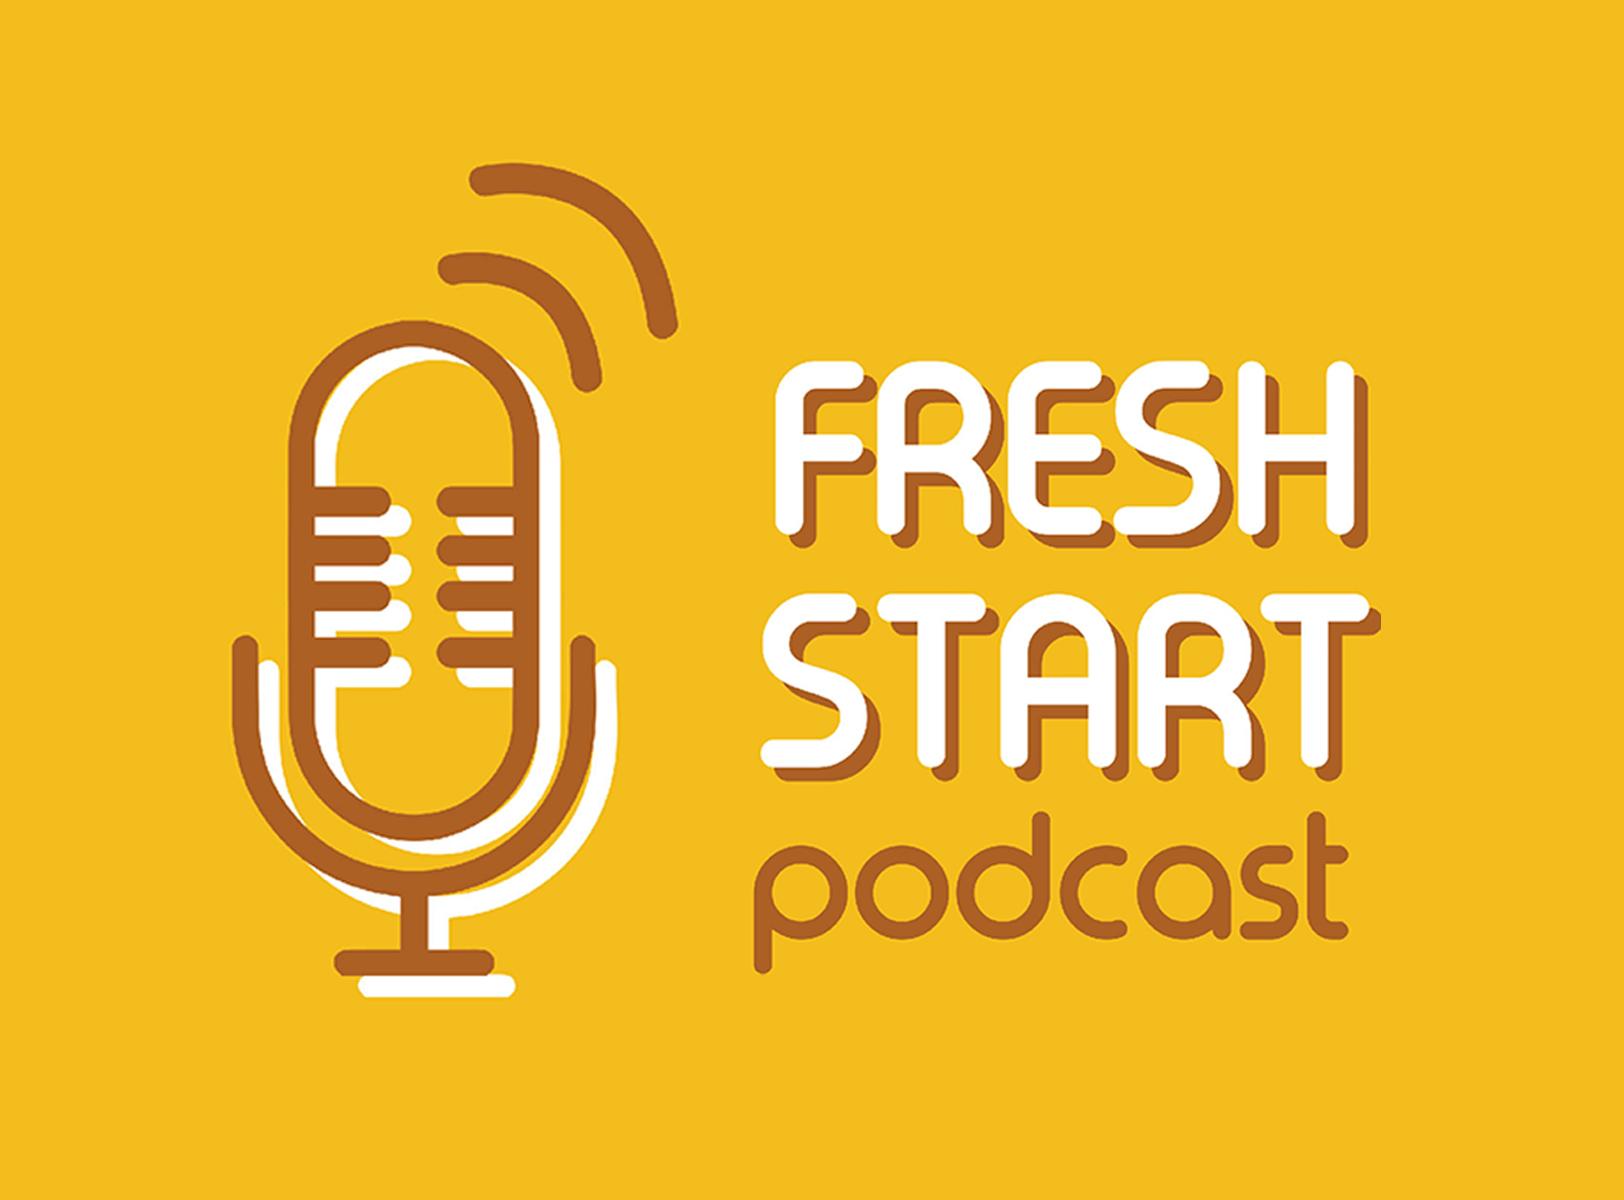 Fresh Start: Podcast News (2/26/2019 Tue.)